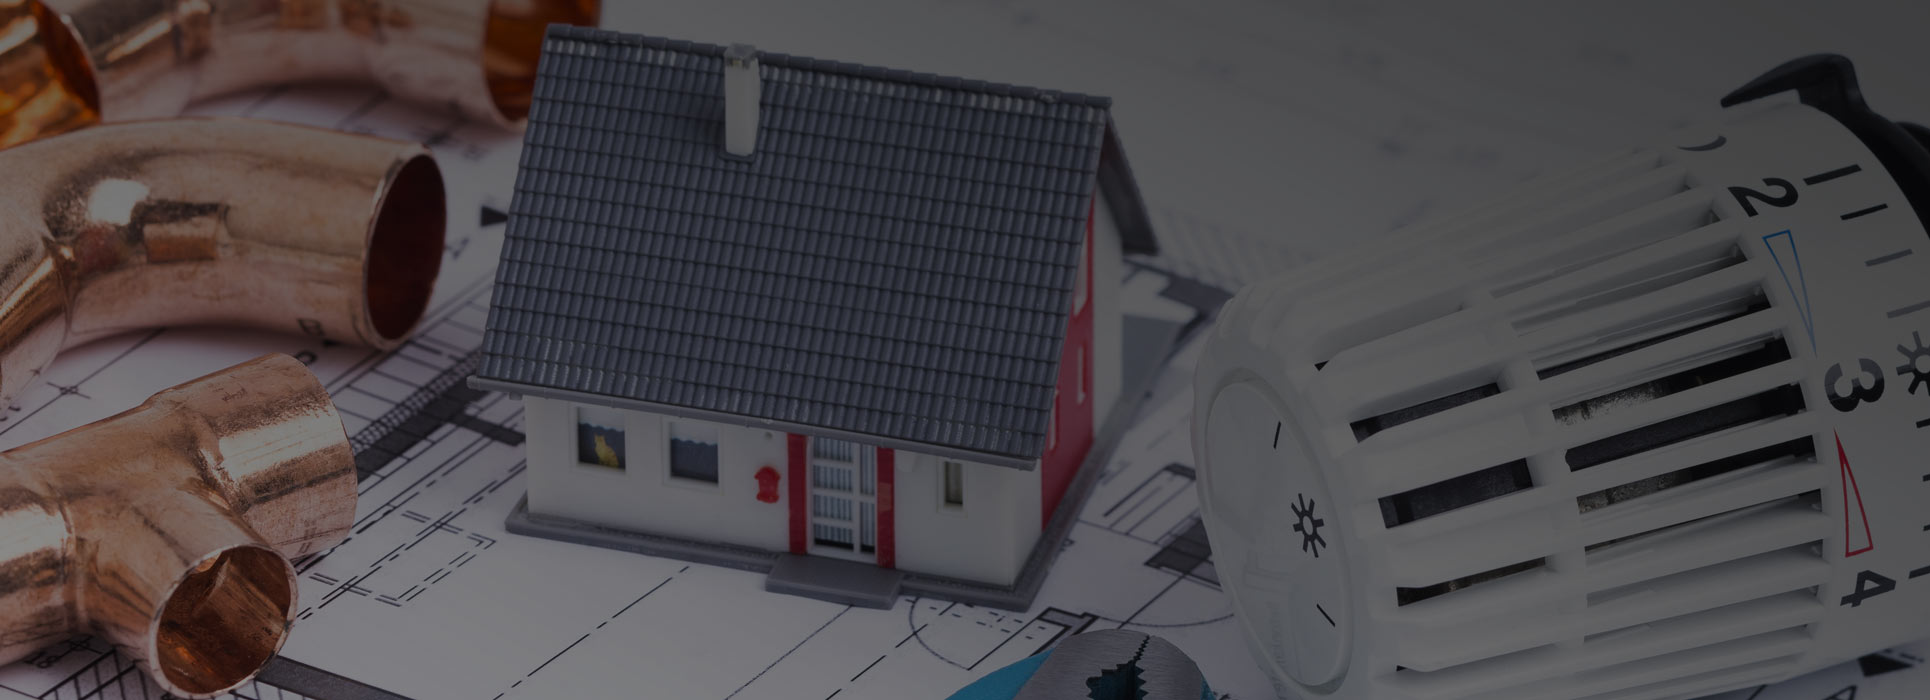 haustechnik-nachtrab-header